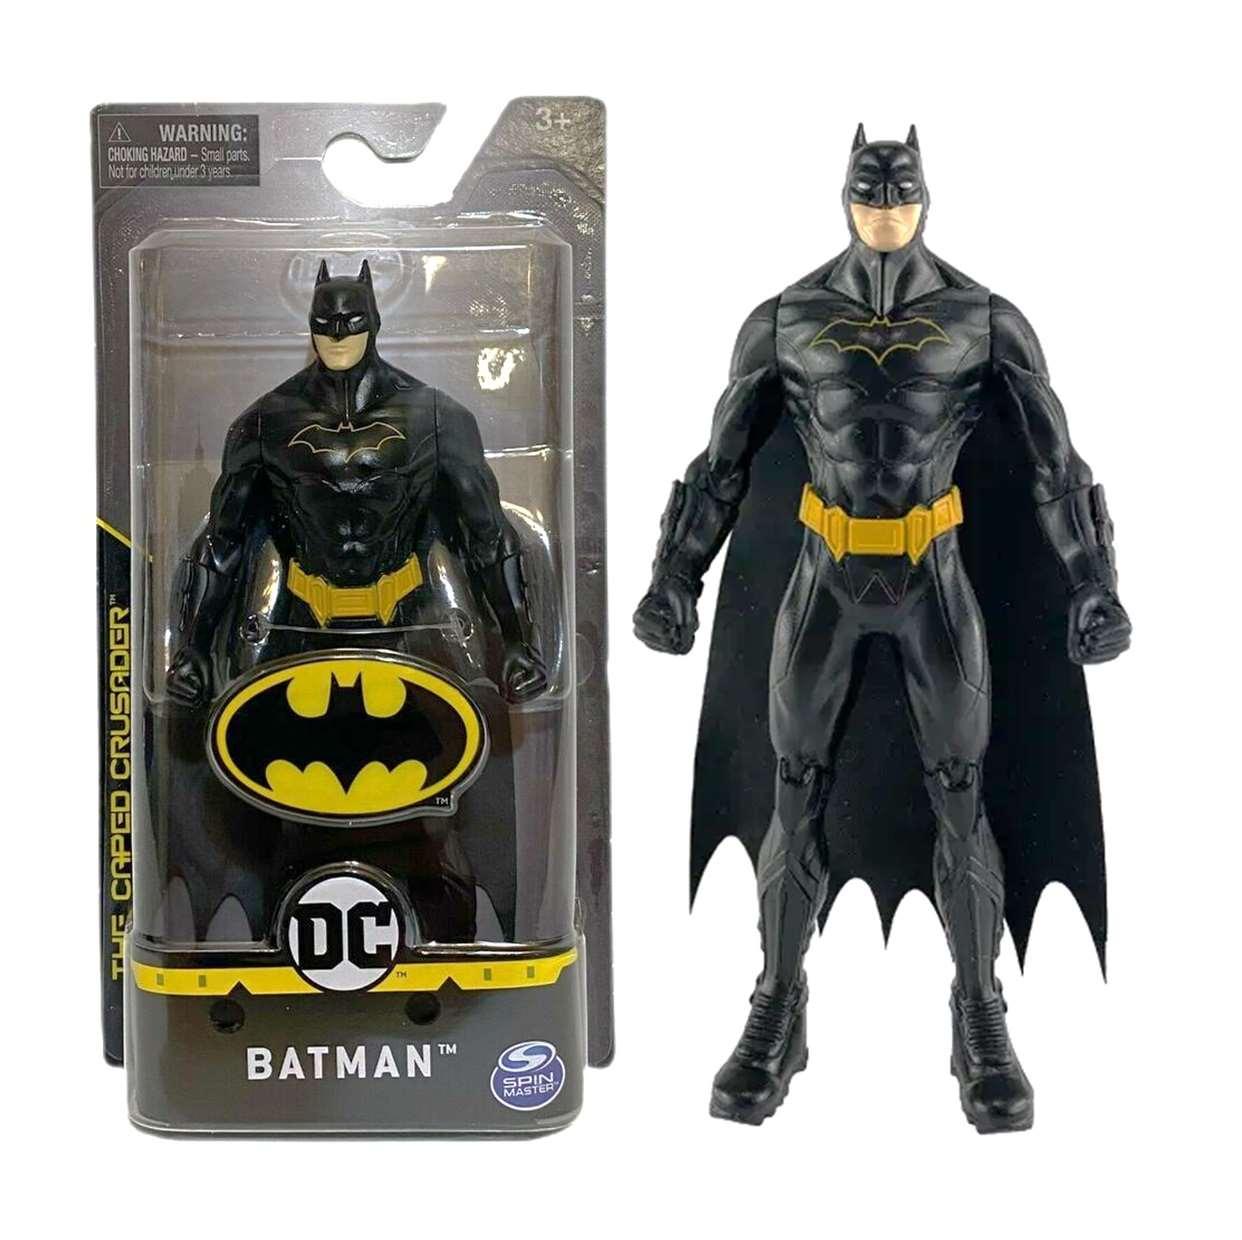 Batman Figura Dc The Caped Crusader Spin Master 5.5 Pulgadas